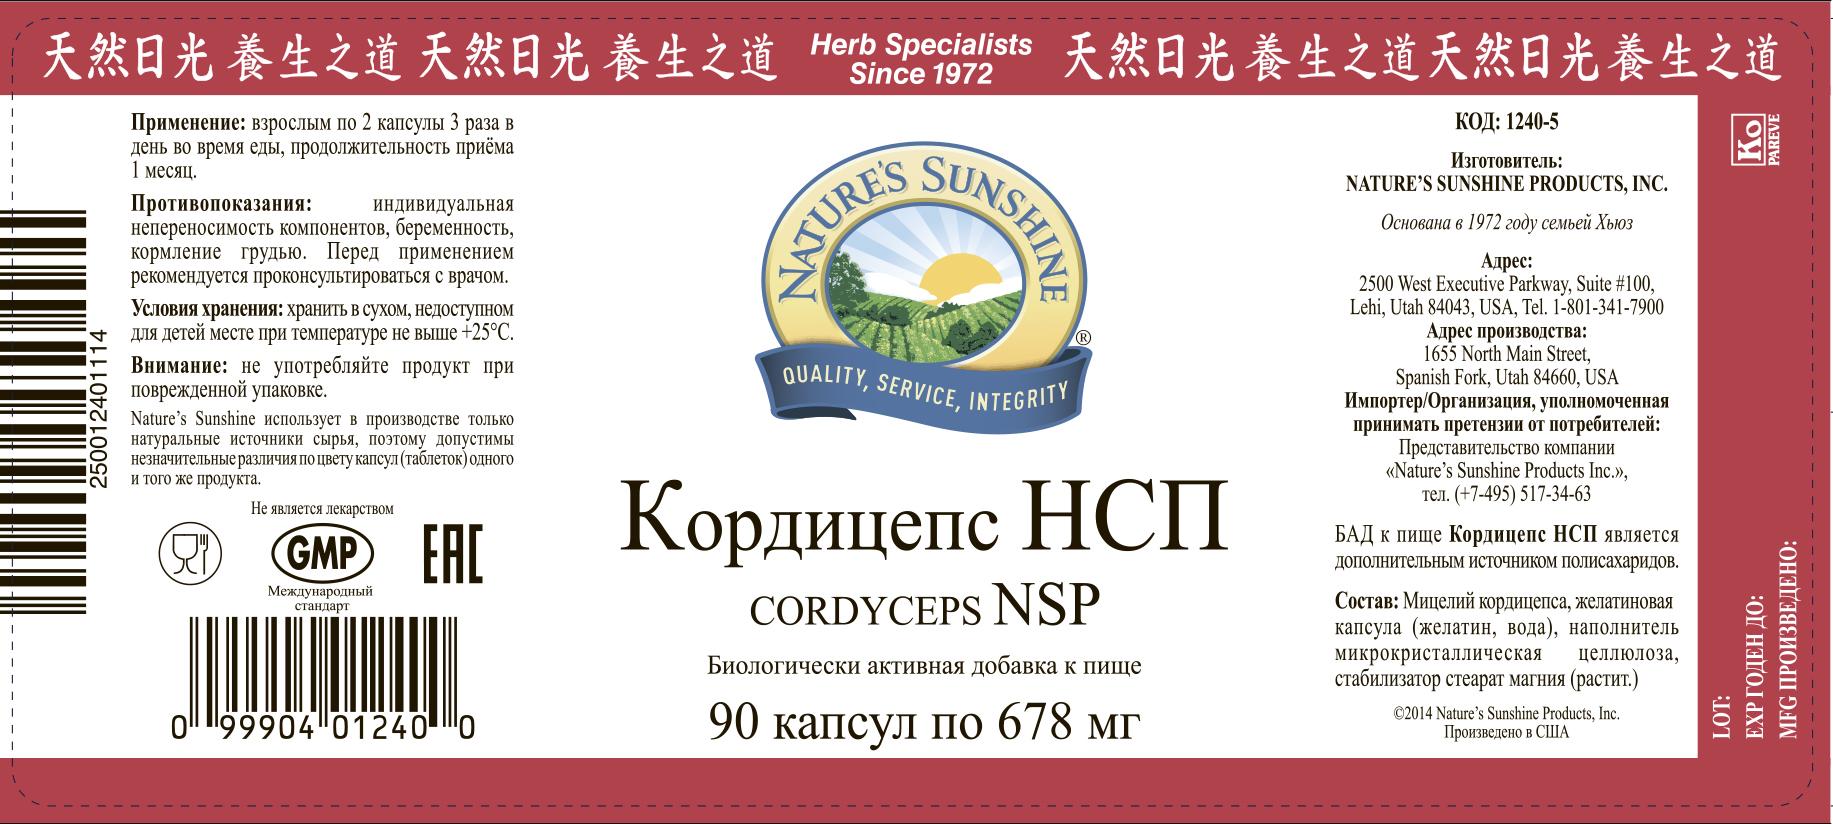 Картинка Кордицепс НСП / Cordyceps NSP от магазина Nature's Sunshine Products